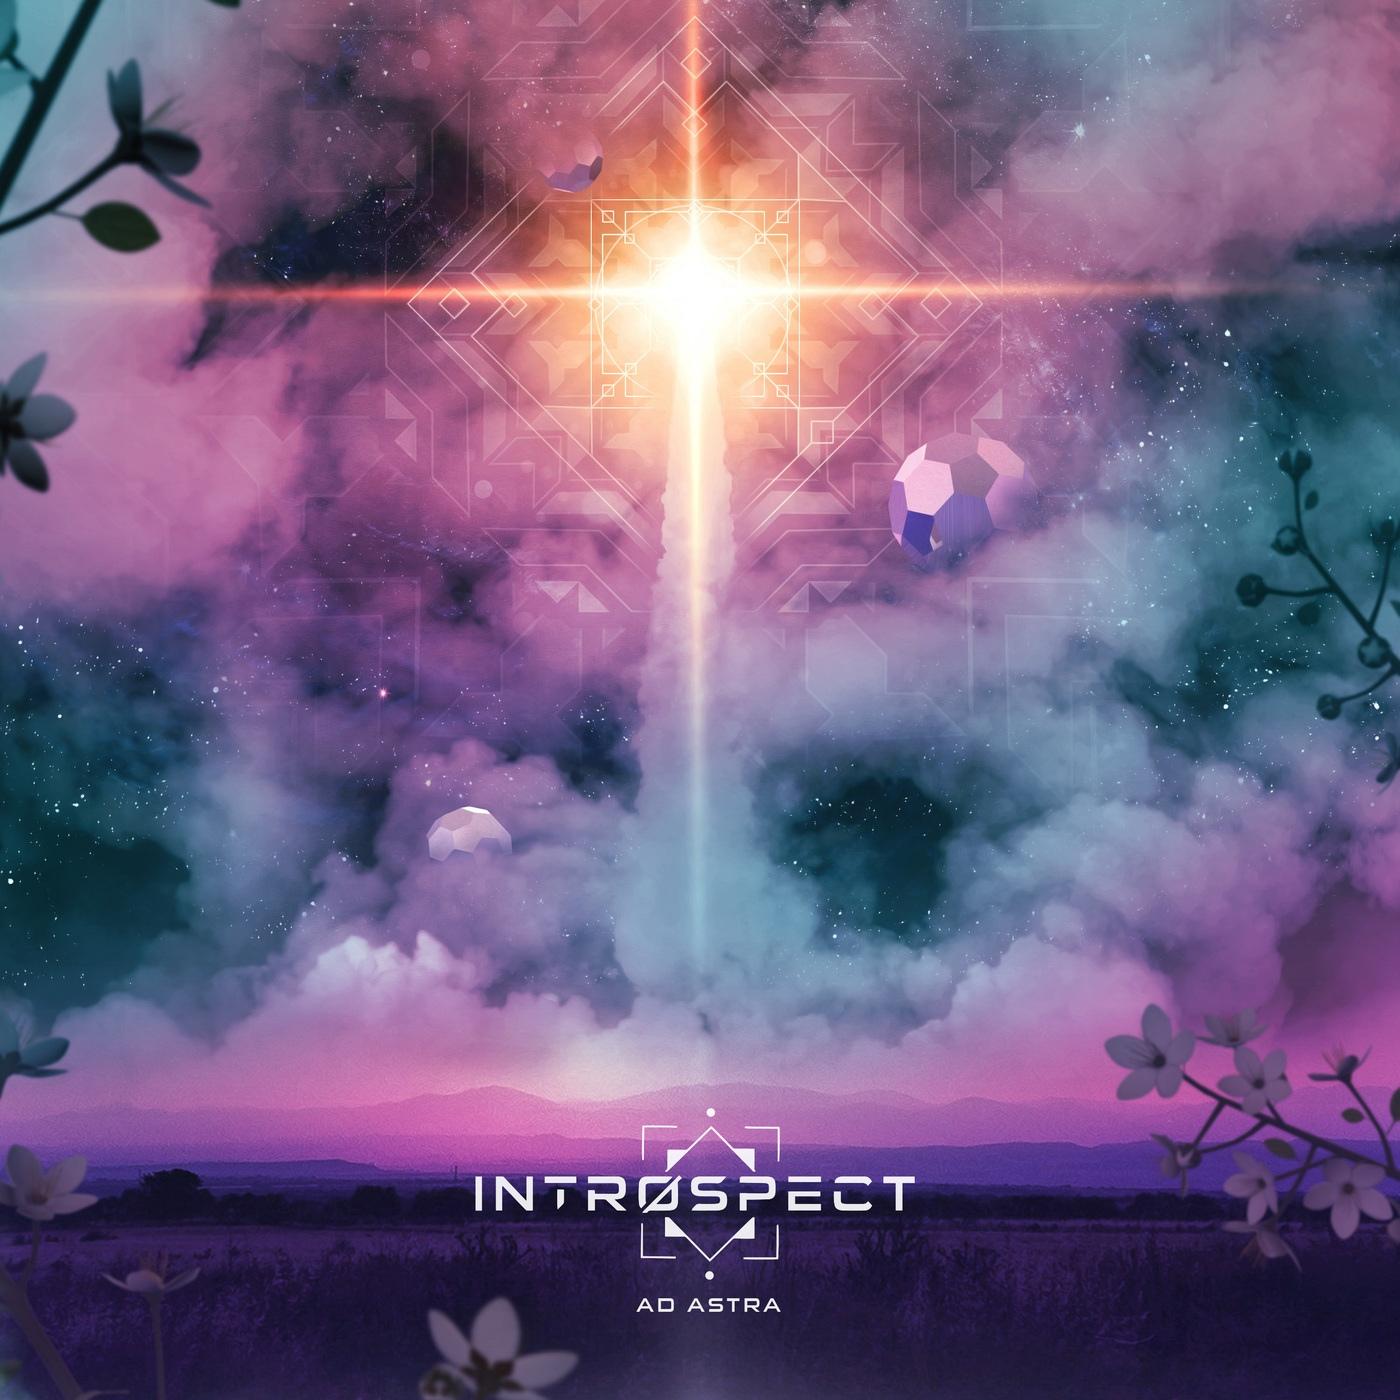 Intrøspect - Ad Astra (EP)